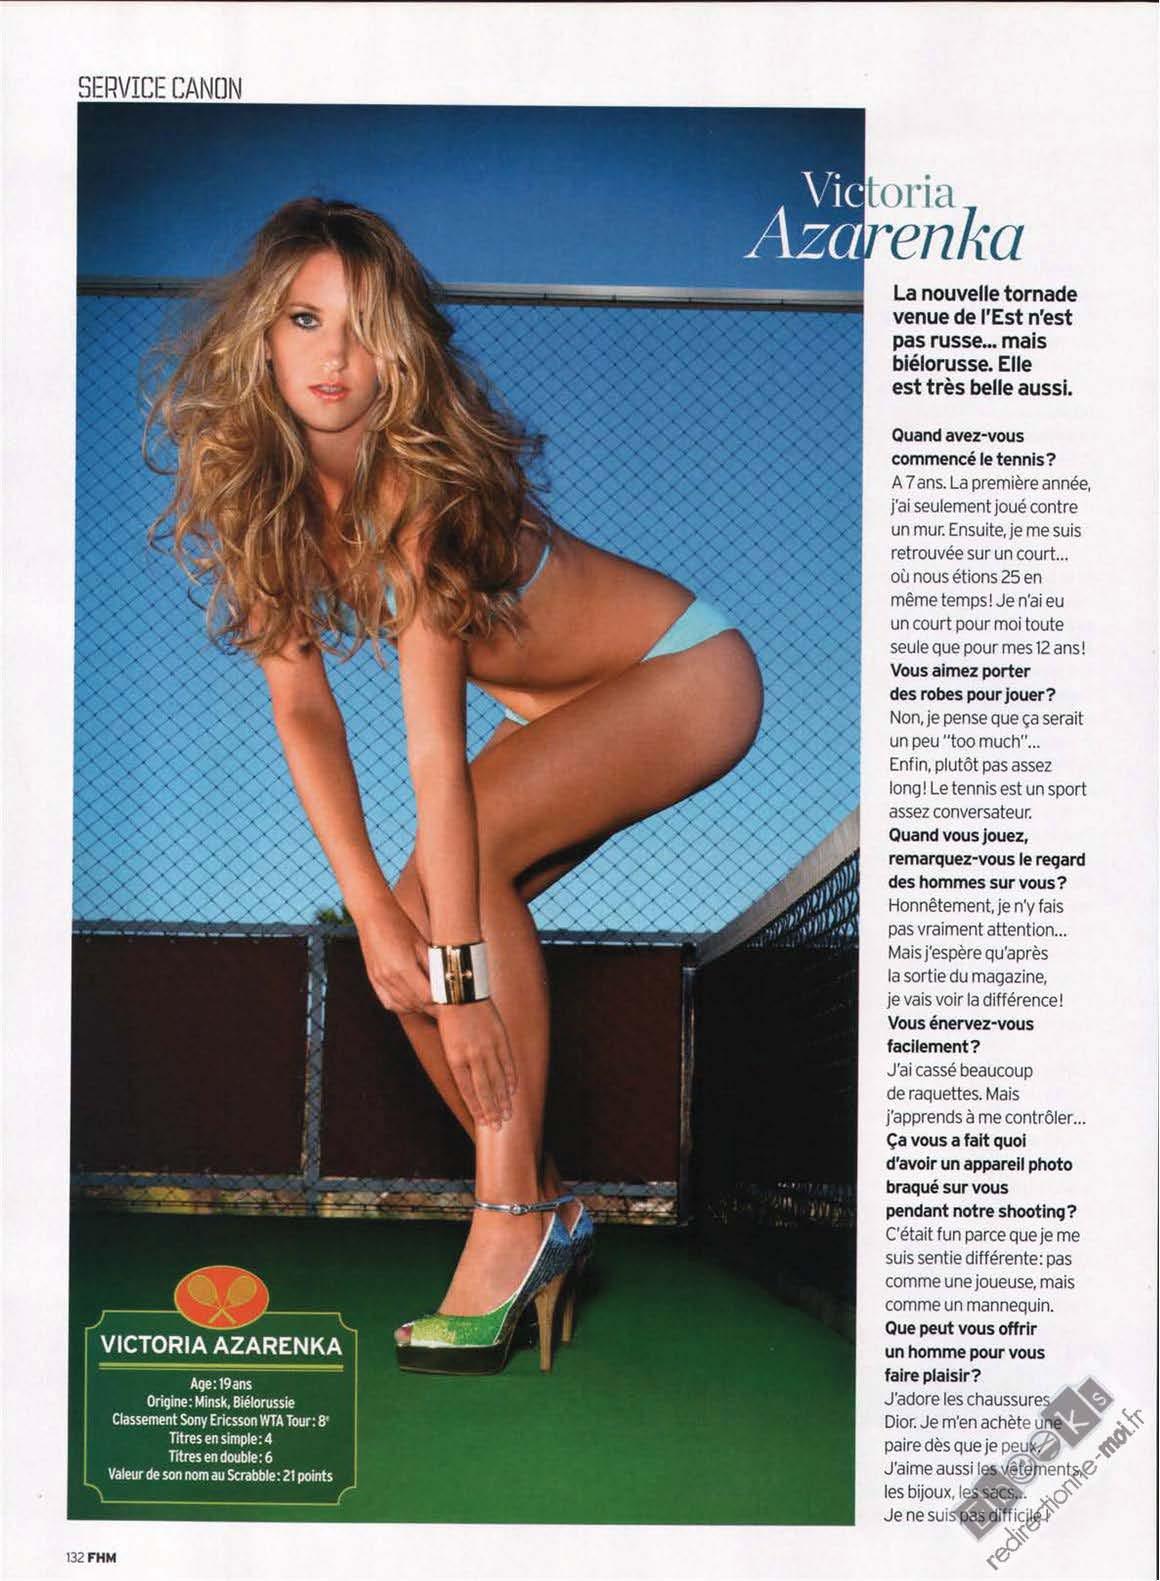 http://4.bp.blogspot.com/-s7Bsj5s82r4/UOalN95ejvI/AAAAAAAAEgQ/vLLnnhPsvW4/s1600/Victoria+Azarenka-hot-01.jpg